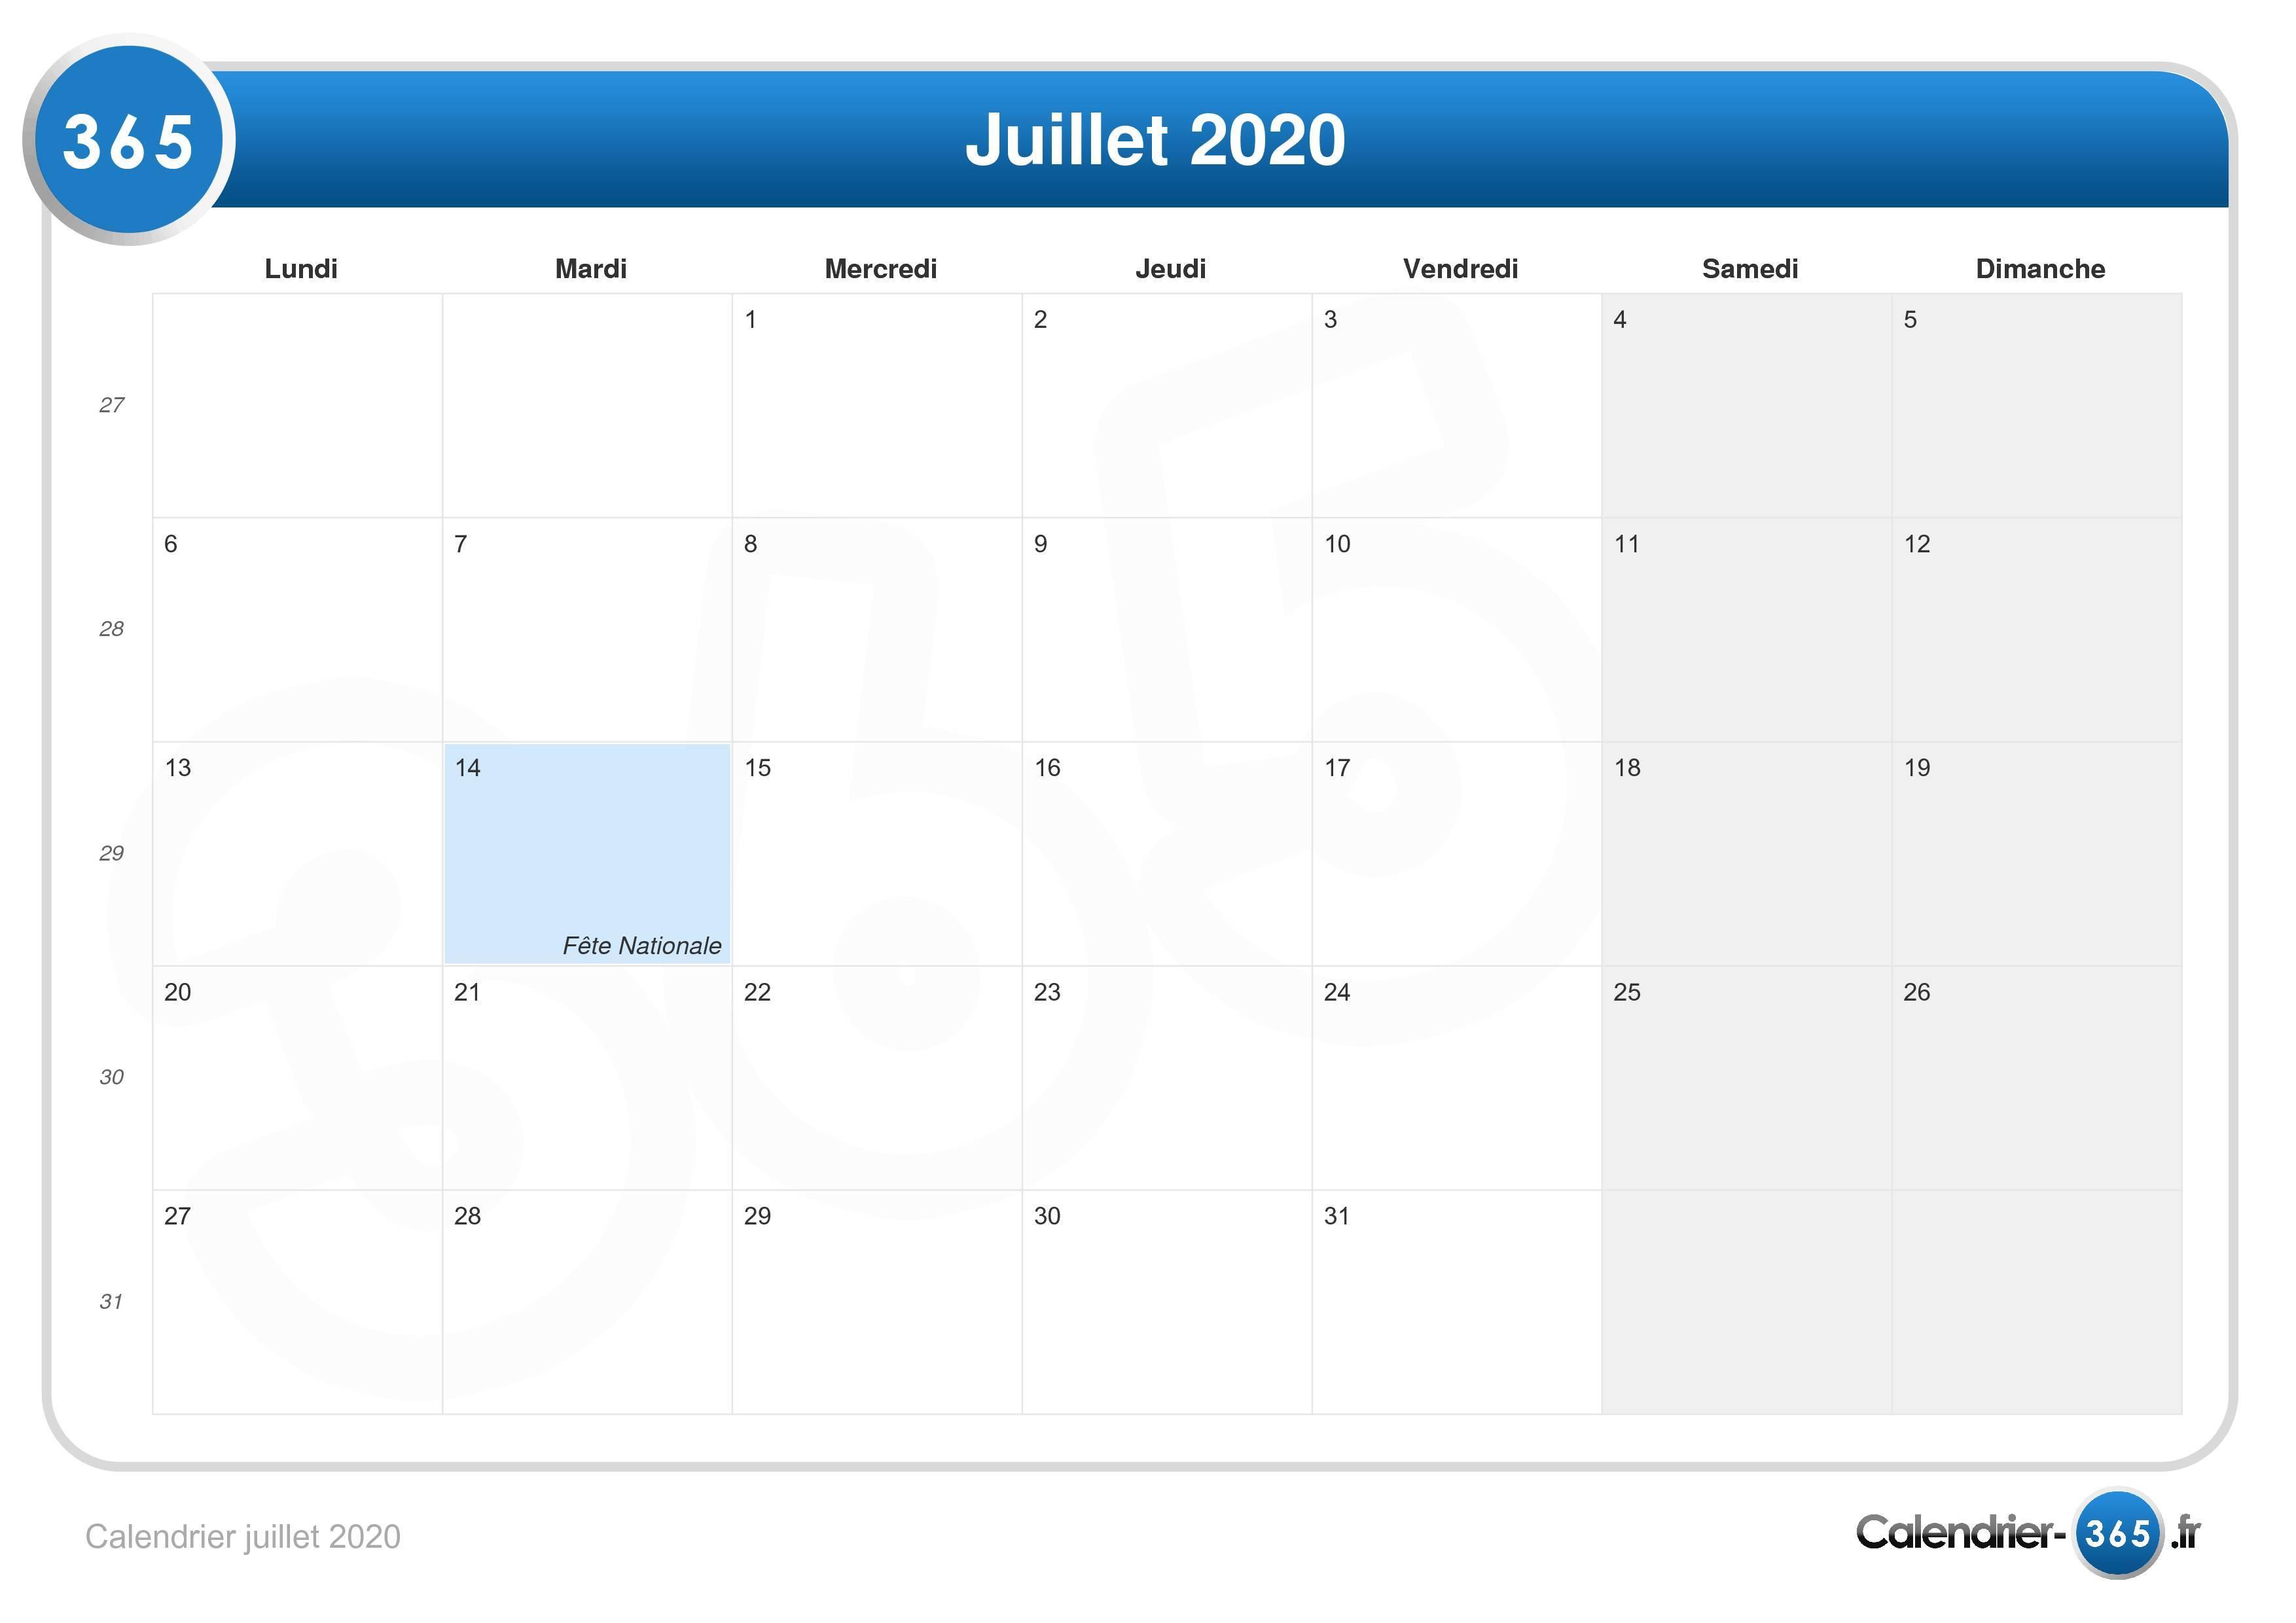 Calendrier Juillet 2020 A Imprimer Gratuit.Calendrier Juillet 2020